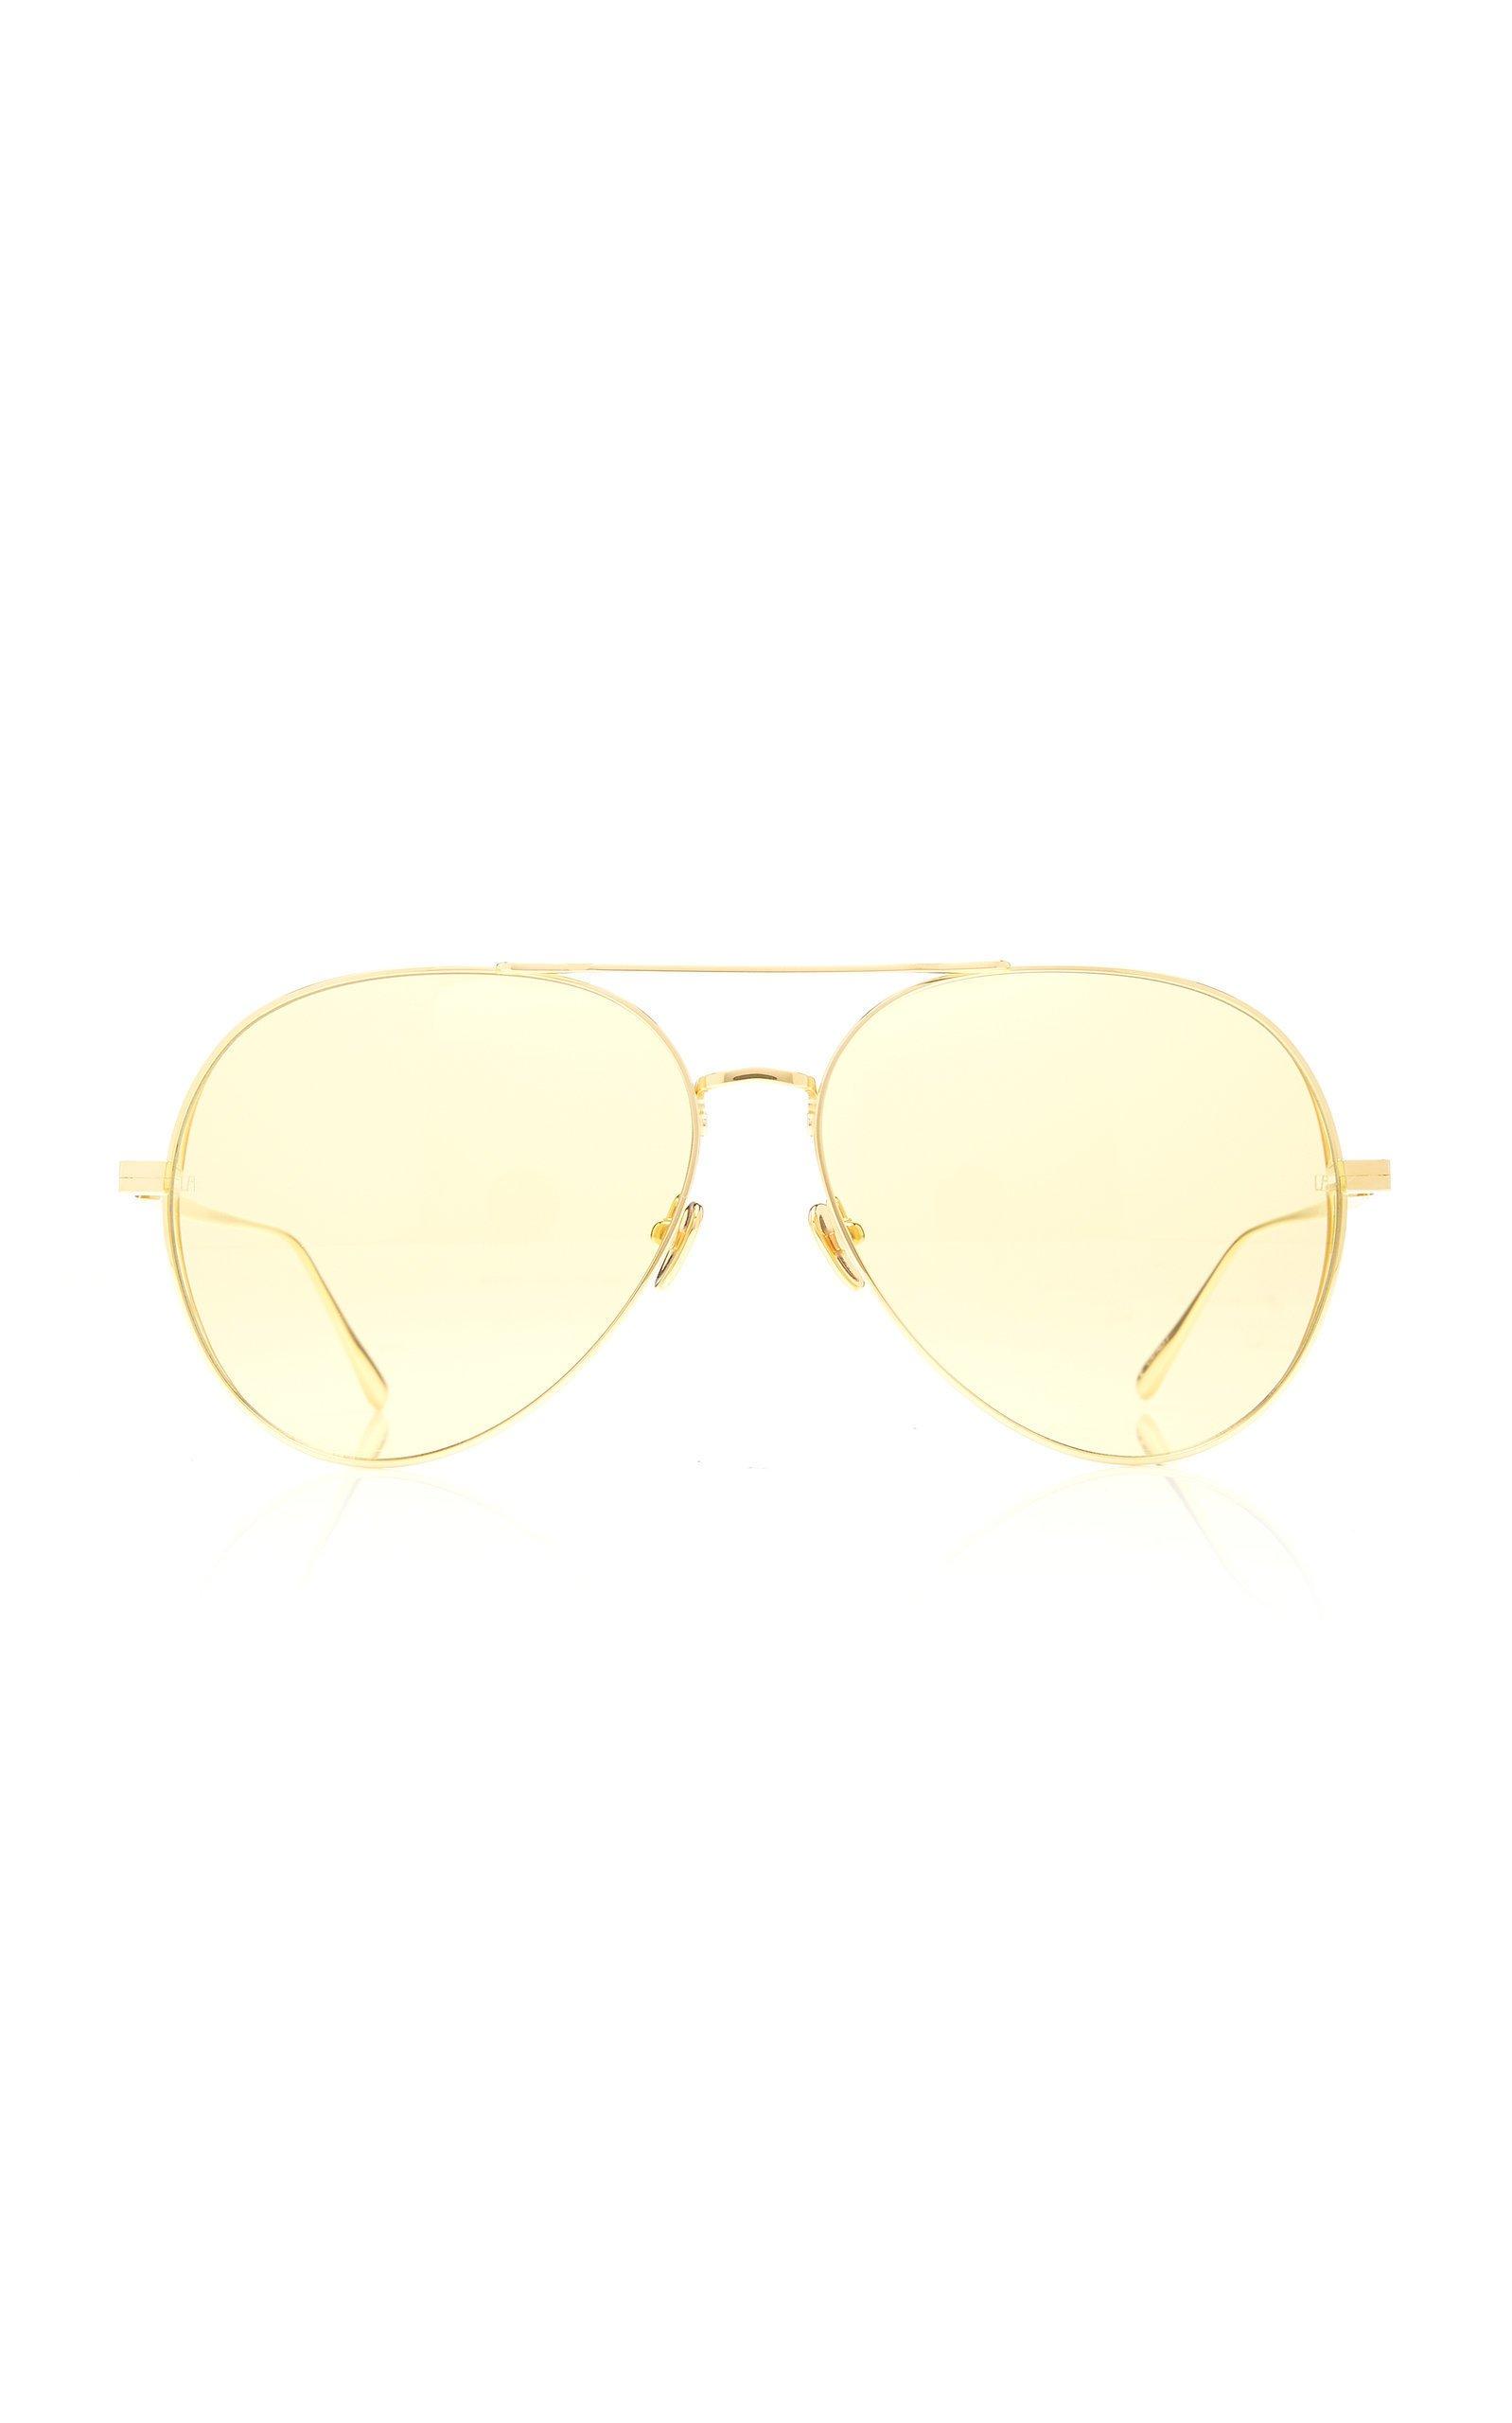 Linda Farrow Aviator-Style Gold-Tone Sunglasses